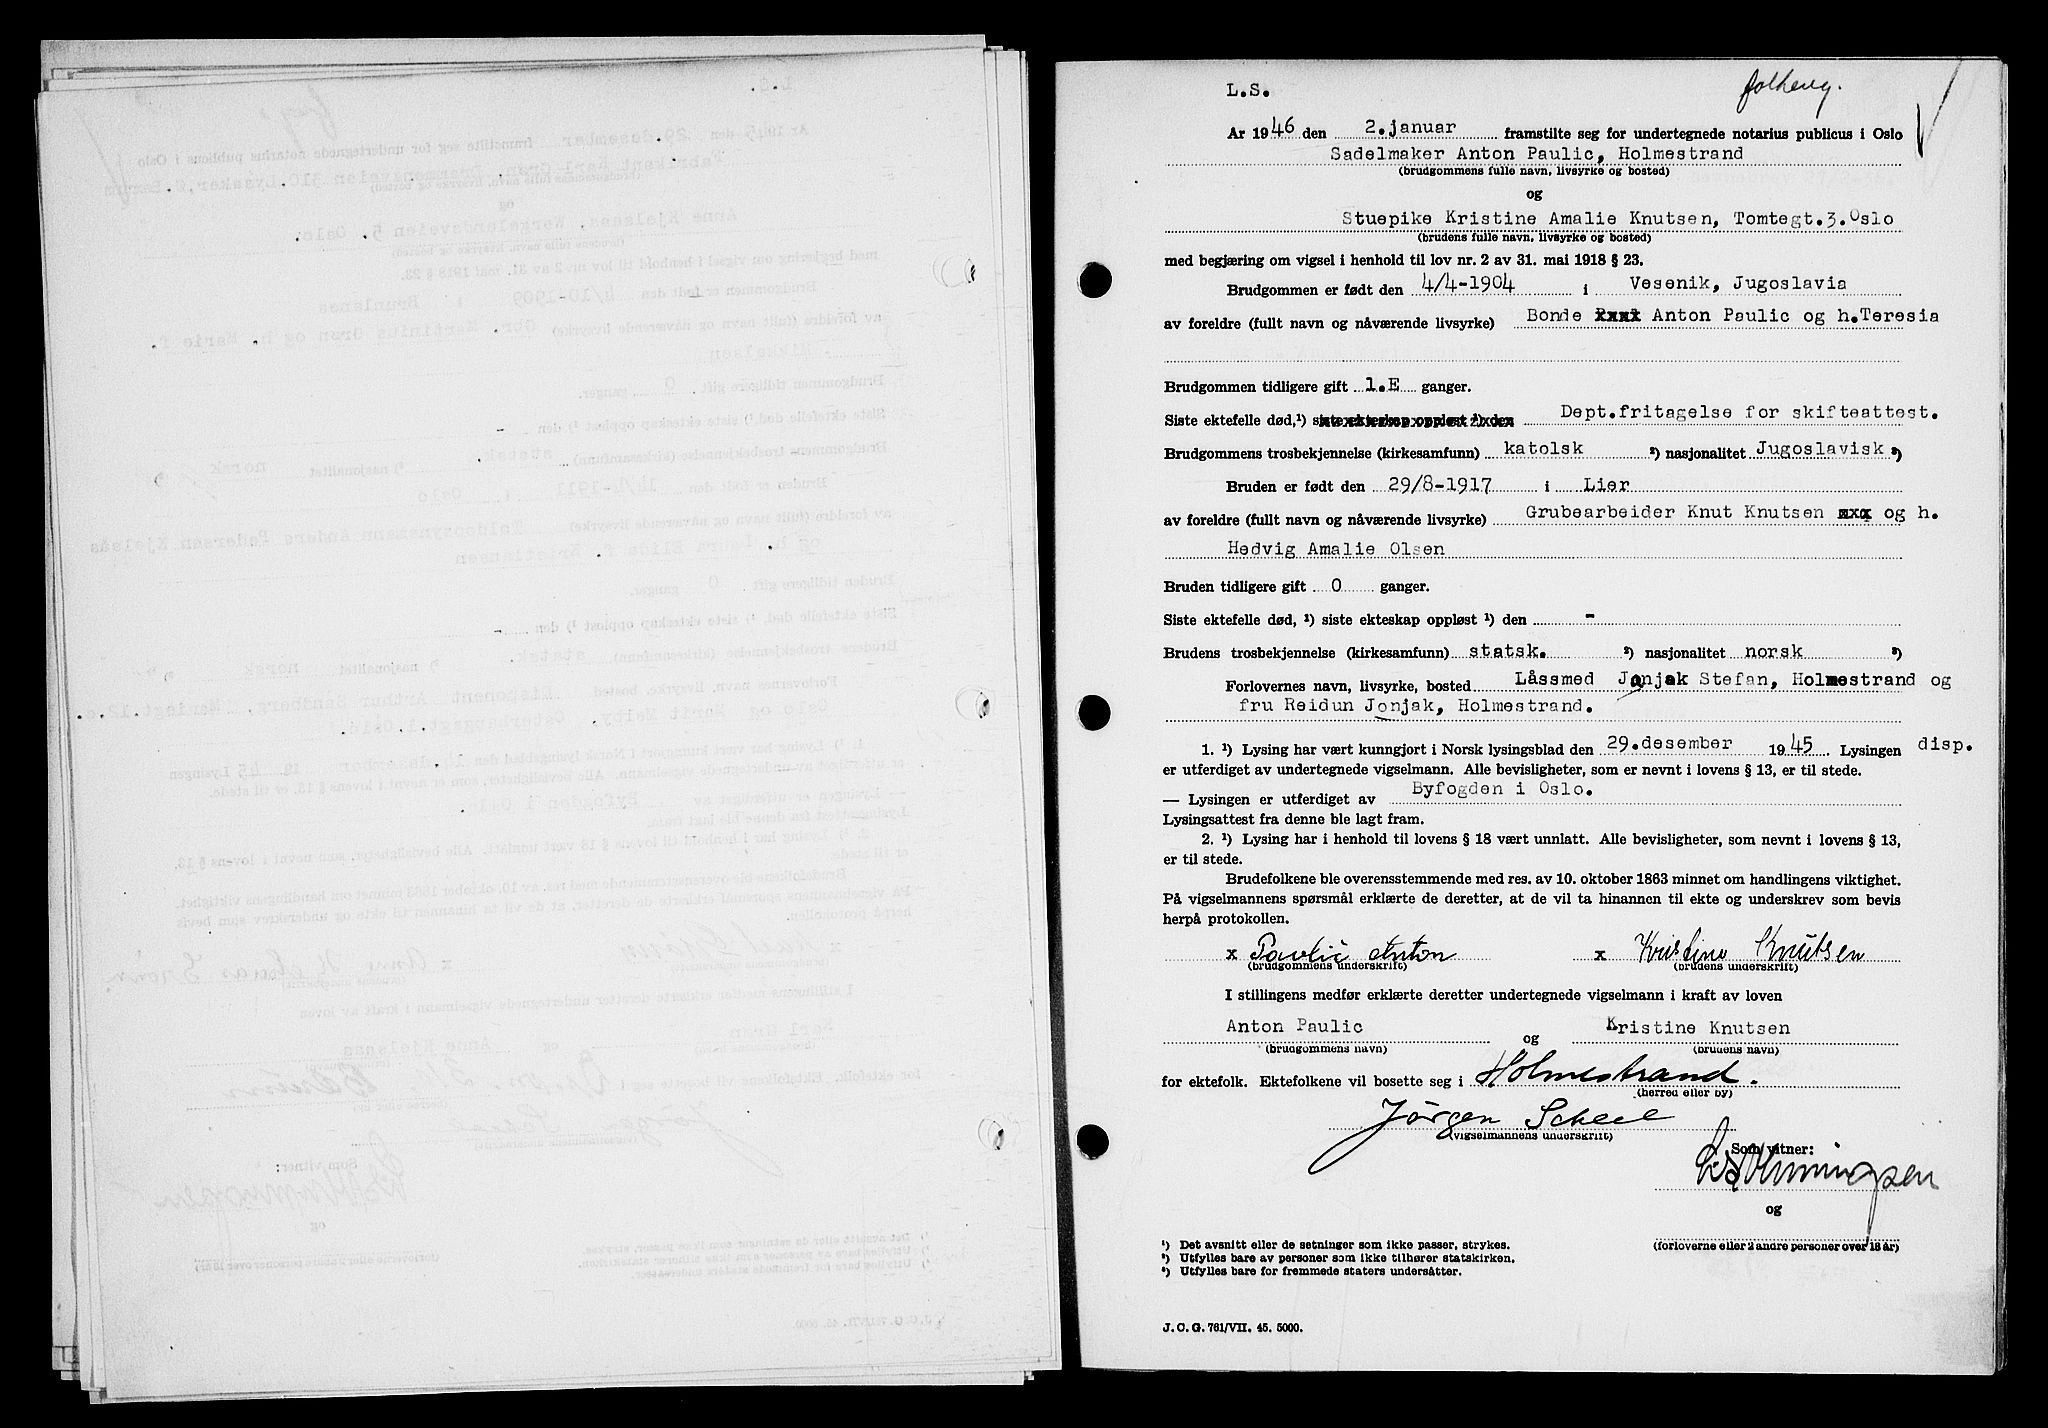 SAO, Oslo byfogd avd. I, L/Lb/Lbb/L0055: Notarialprotokoll, rekke II: Vigsler, 1945-1946, s. upaginert